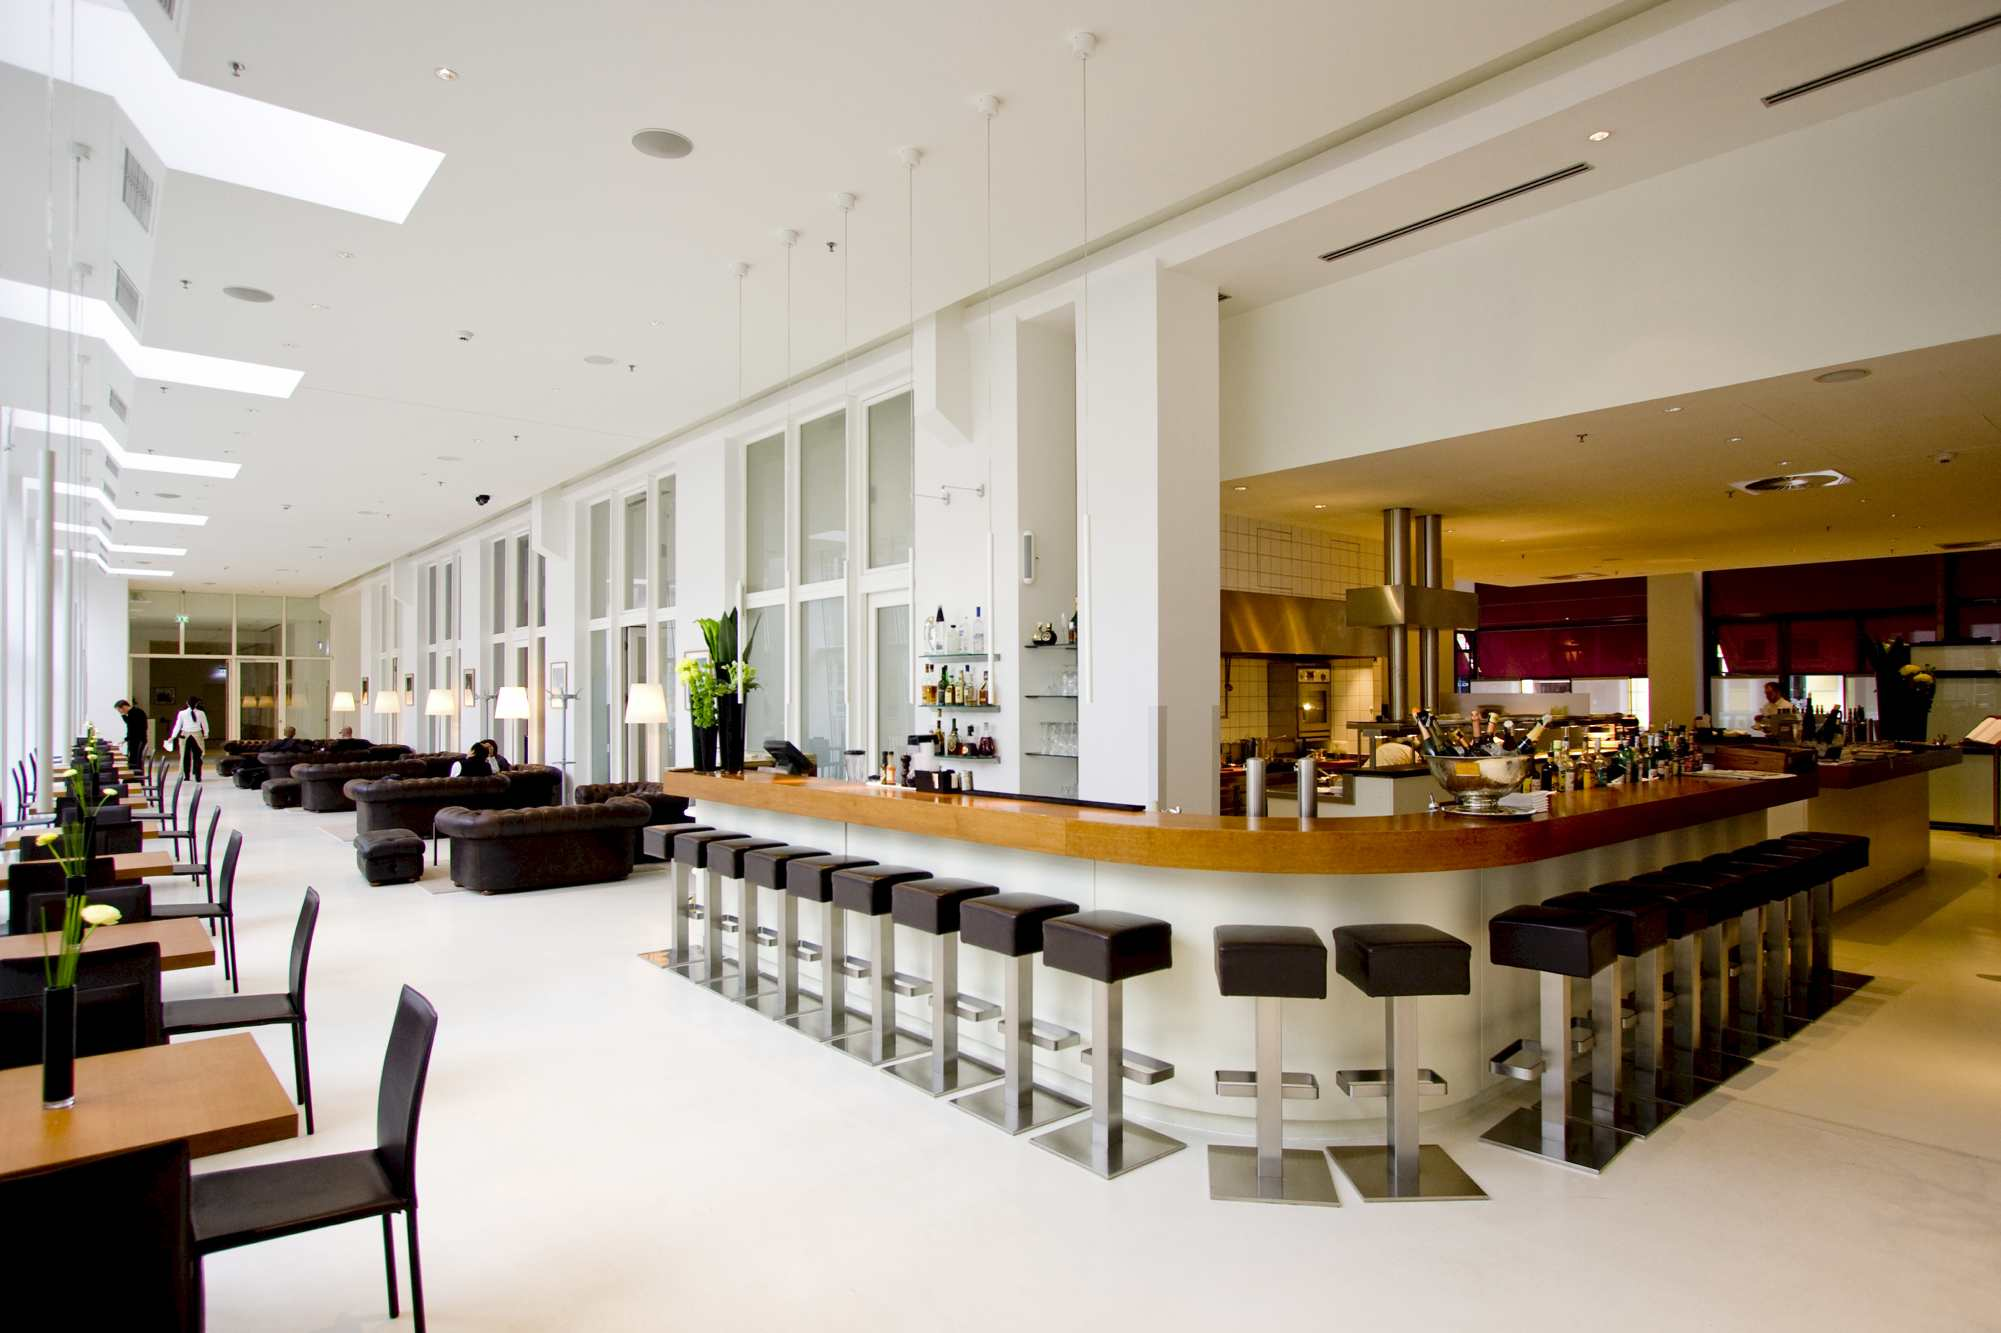 jazz im glas die duke bar im ellington hotel in berlin mixology. Black Bedroom Furniture Sets. Home Design Ideas